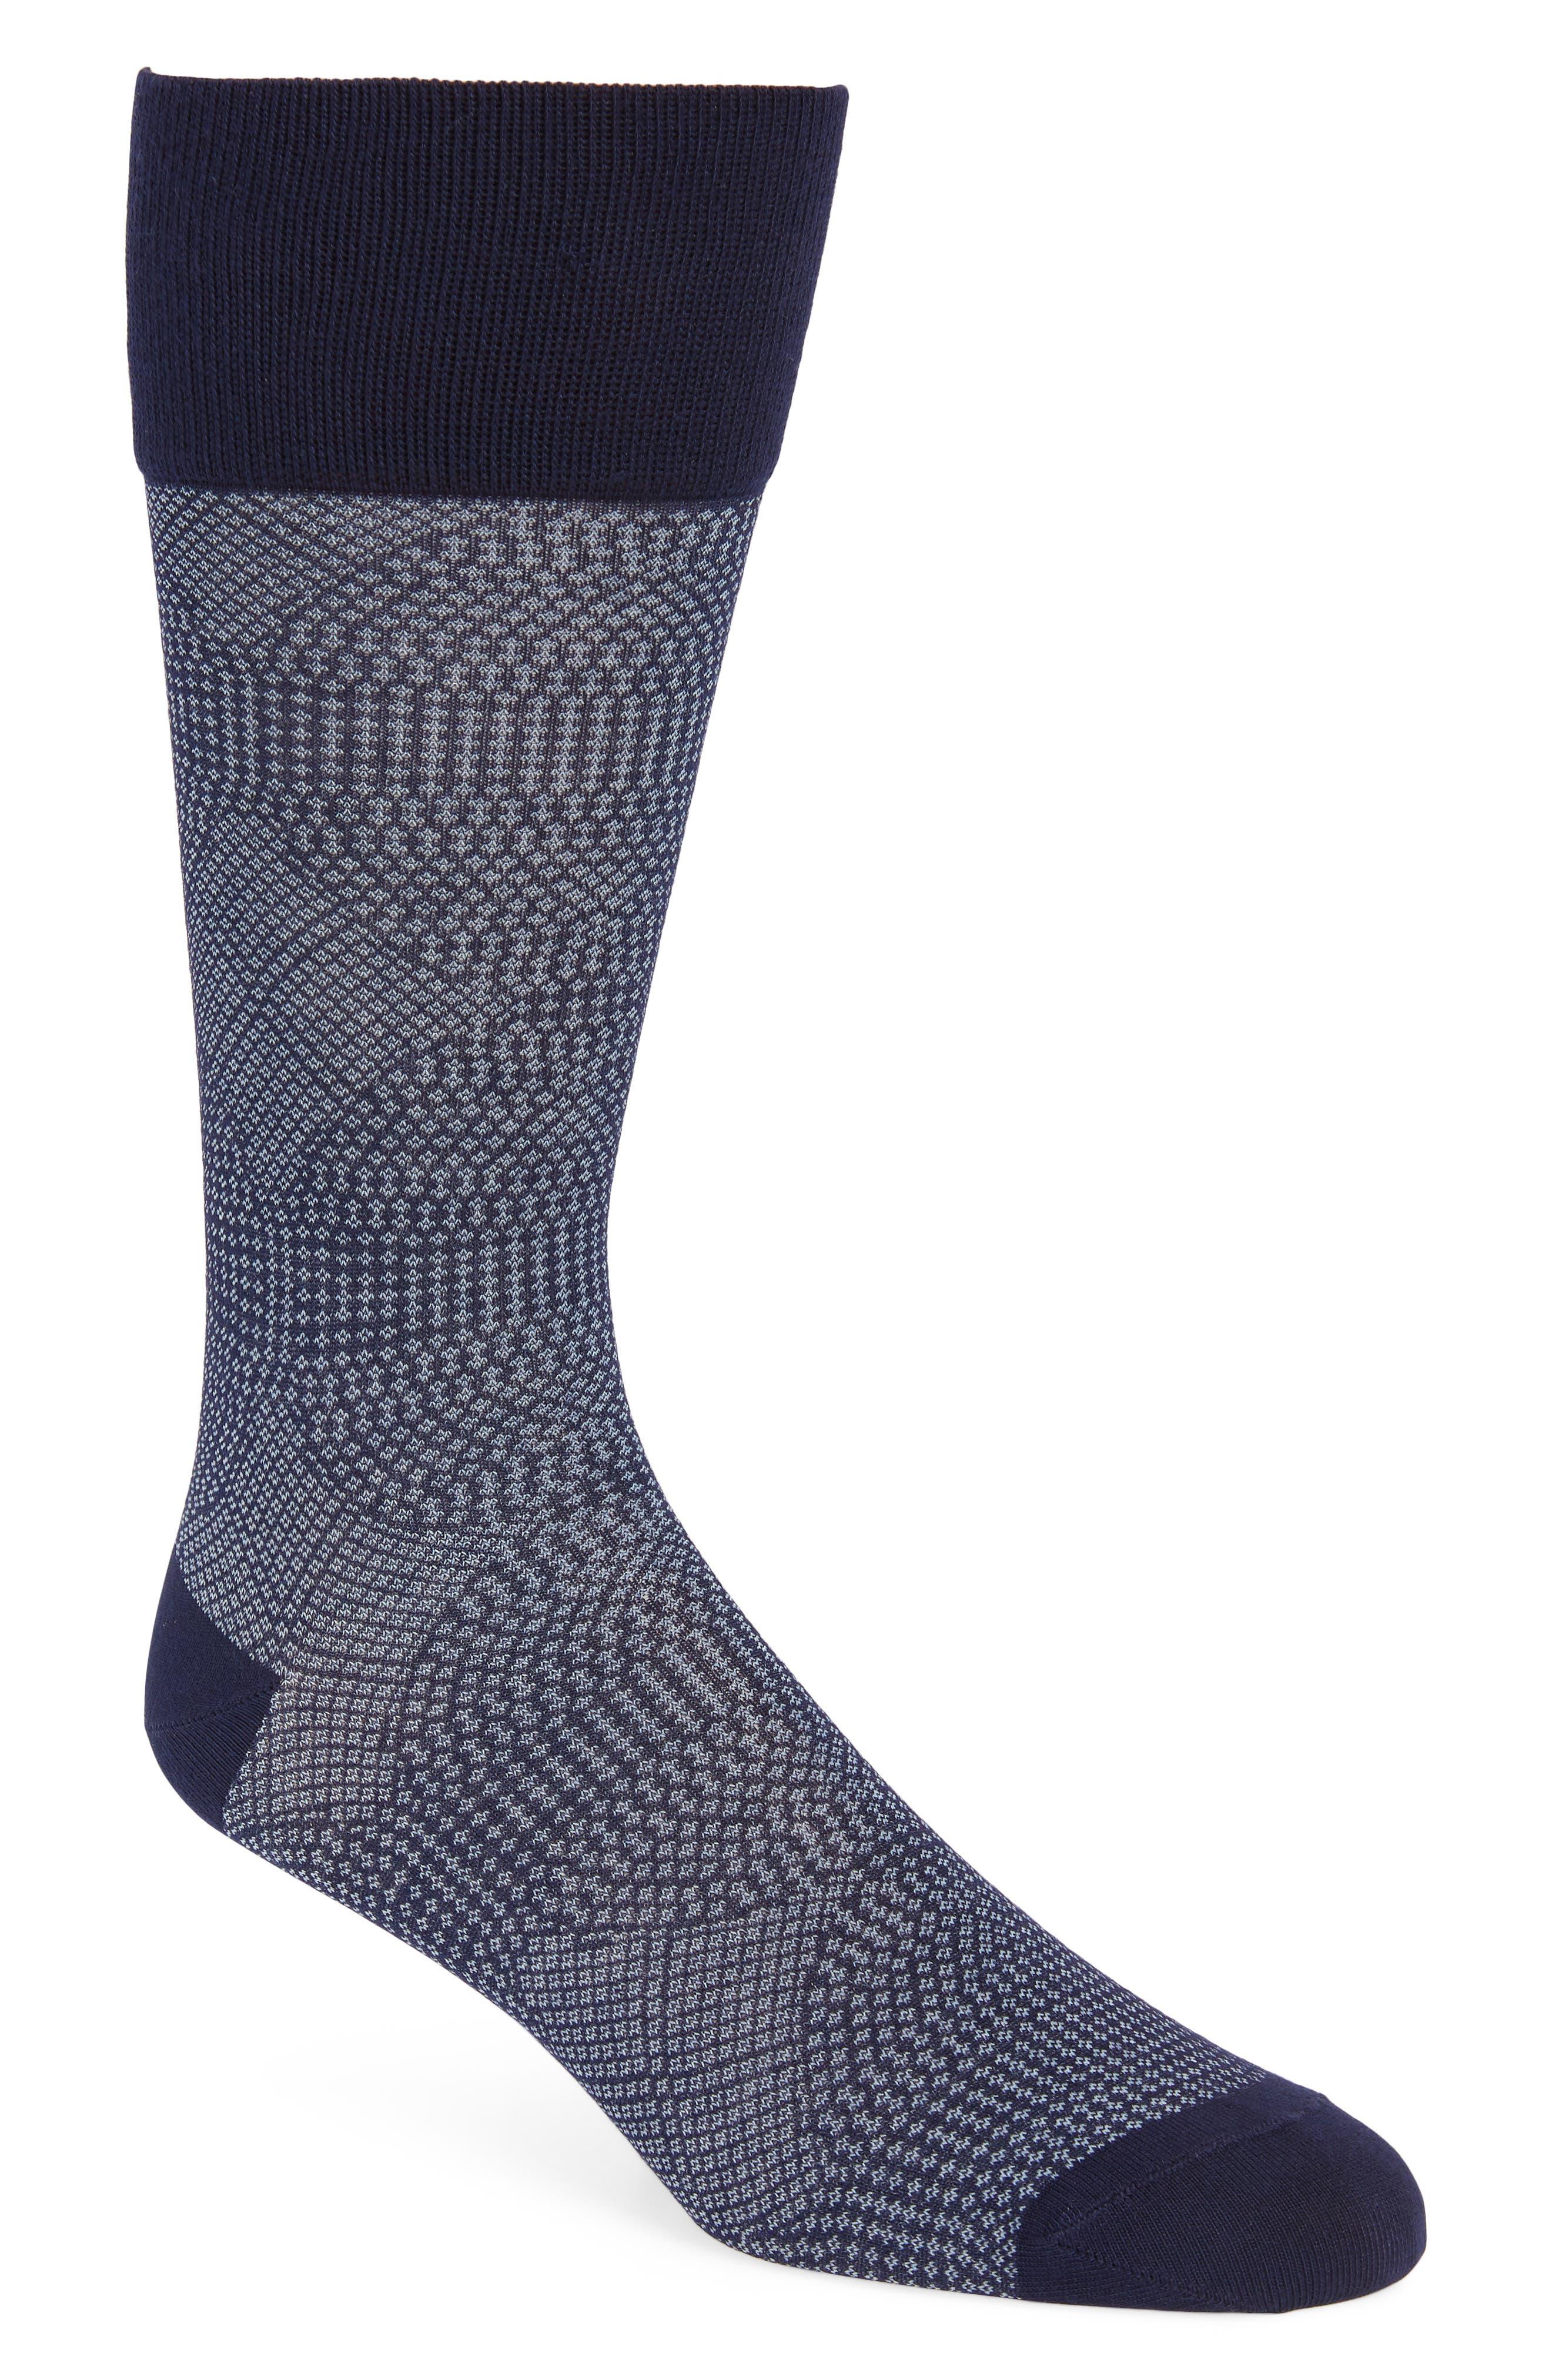 Quatrefoil Solid Socks,                             Main thumbnail 1, color,                             410